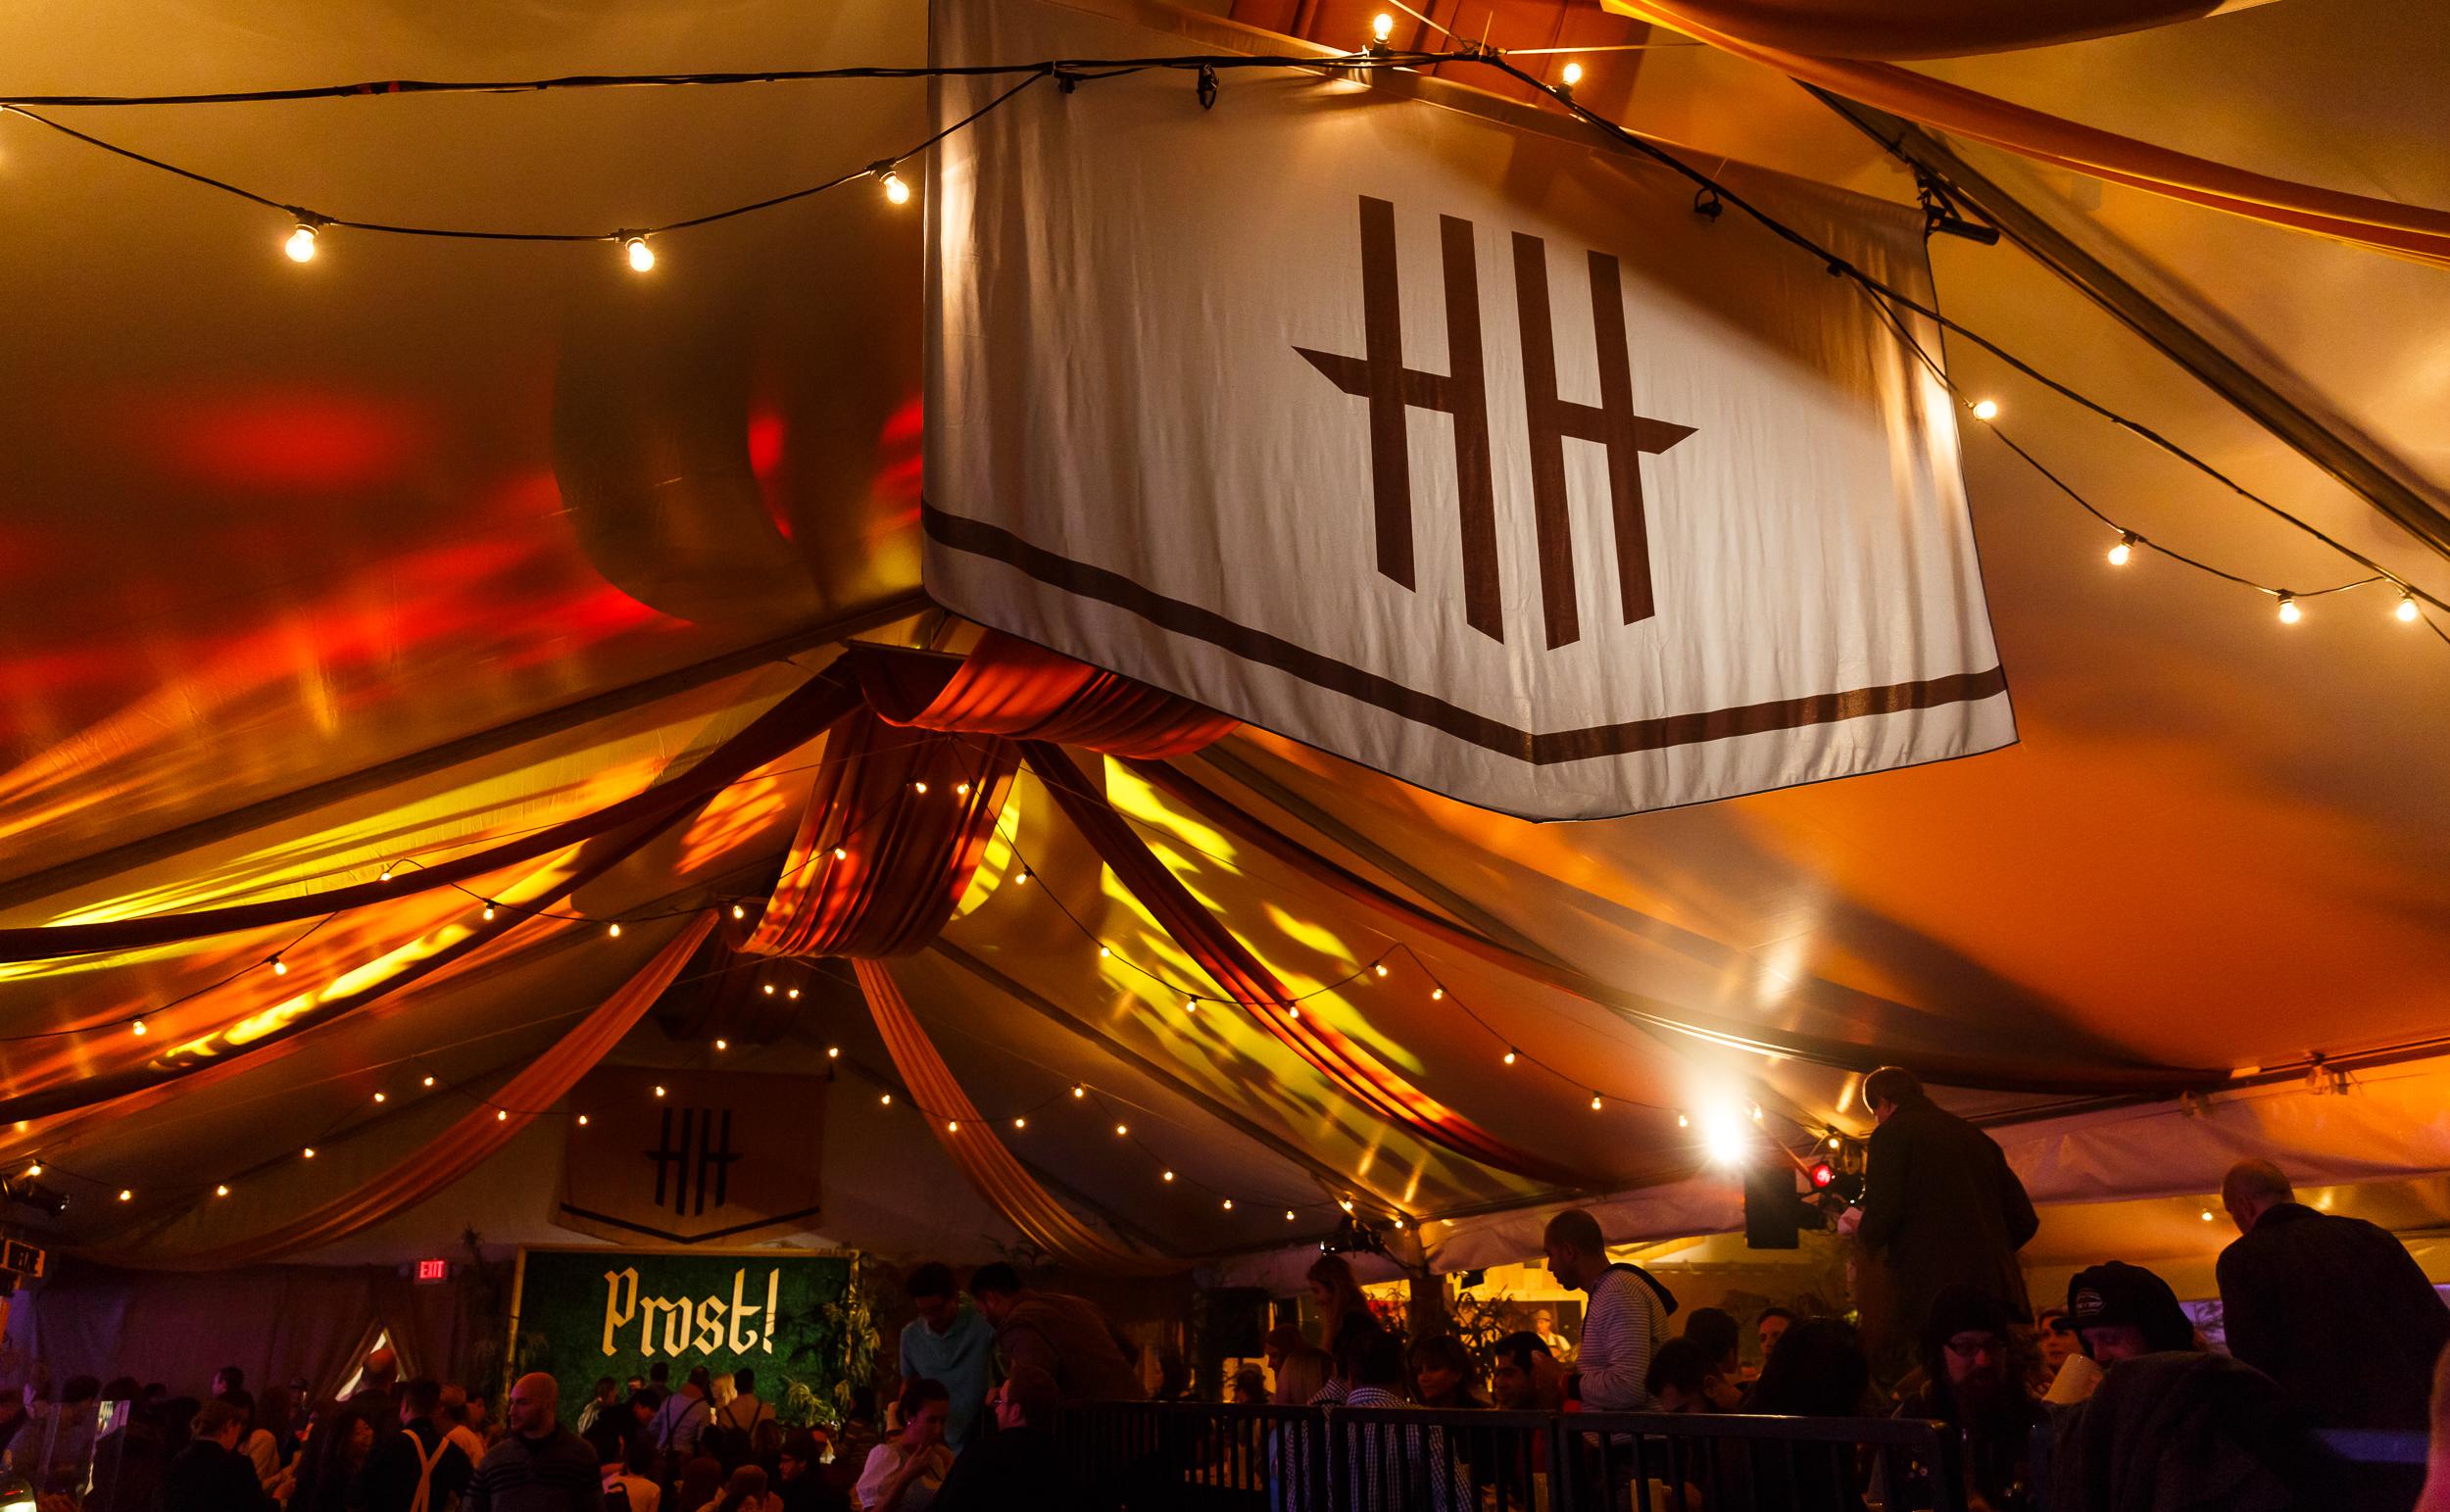 Harvest-Haus-image1.jpg